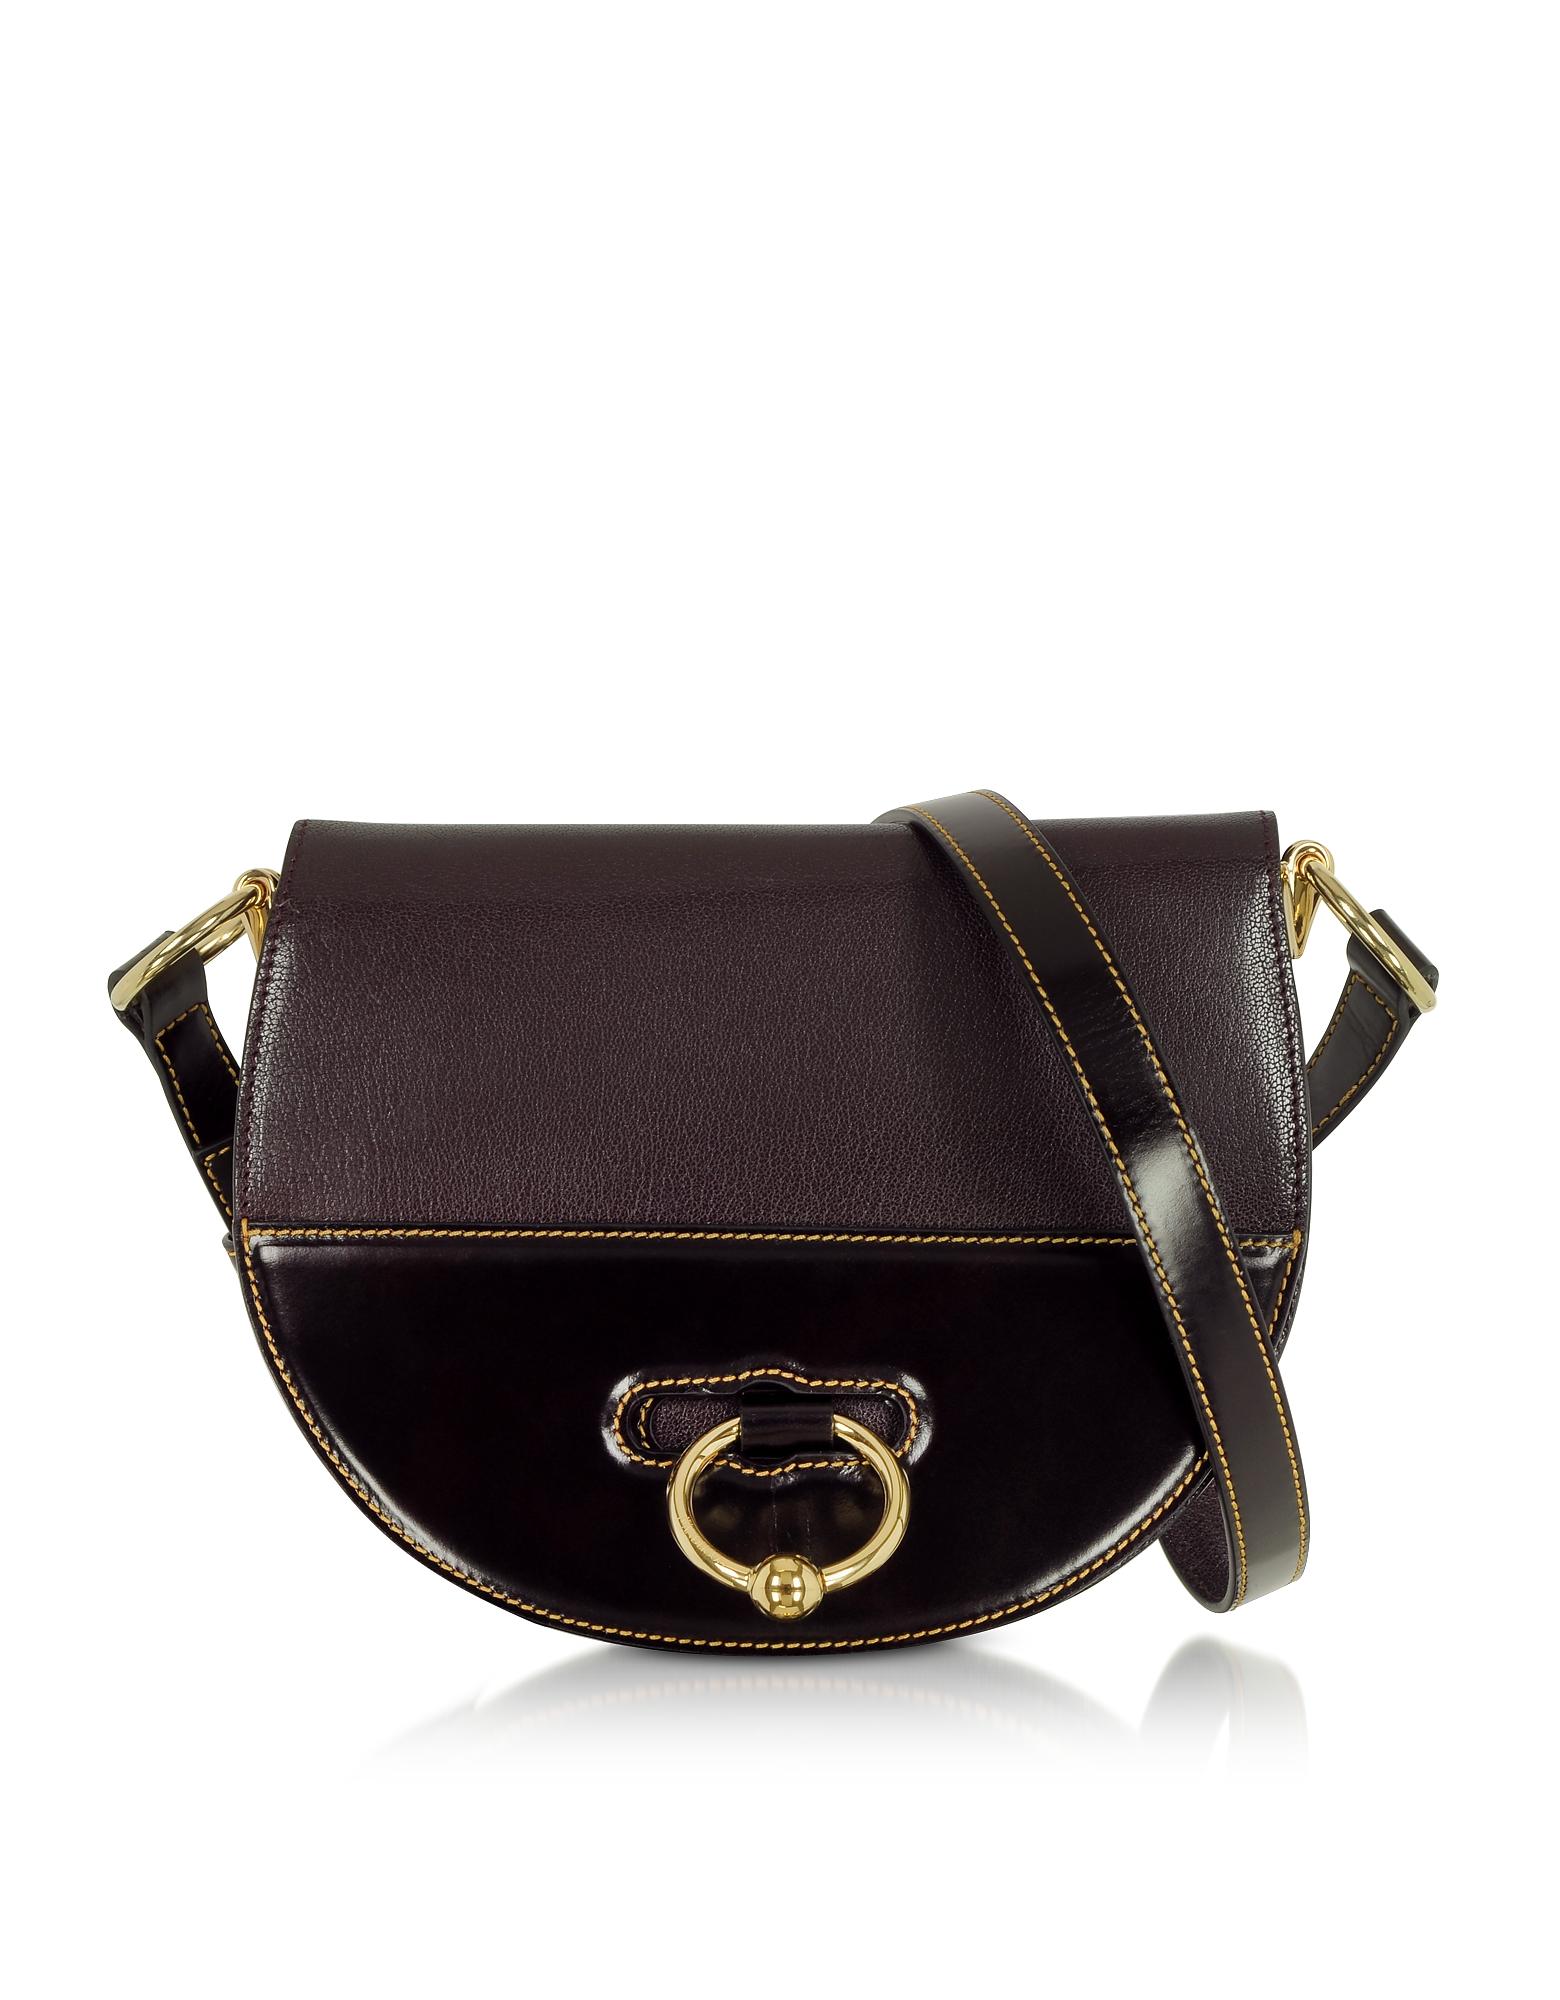 JW Anderson Handbags, Latch Bag w/Shoulder Strap